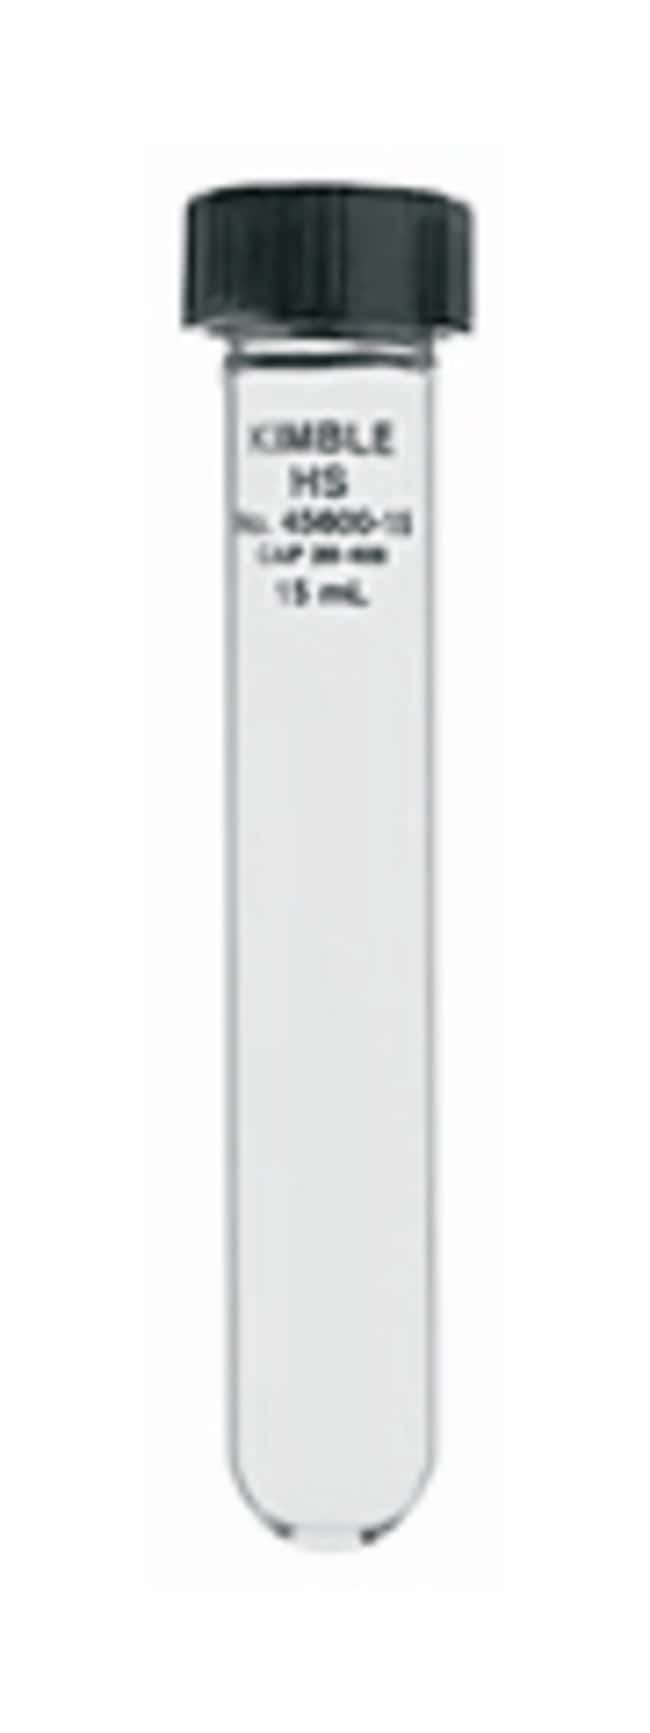 DWK Life SciencesKimble™ Kontes™ KIMAX™ Reusable High Strength Centrifuge Tubes 15mL; With screw cap DWK Life SciencesKimble™ Kontes™ KIMAX™ Reusable High Strength Centrifuge Tubes